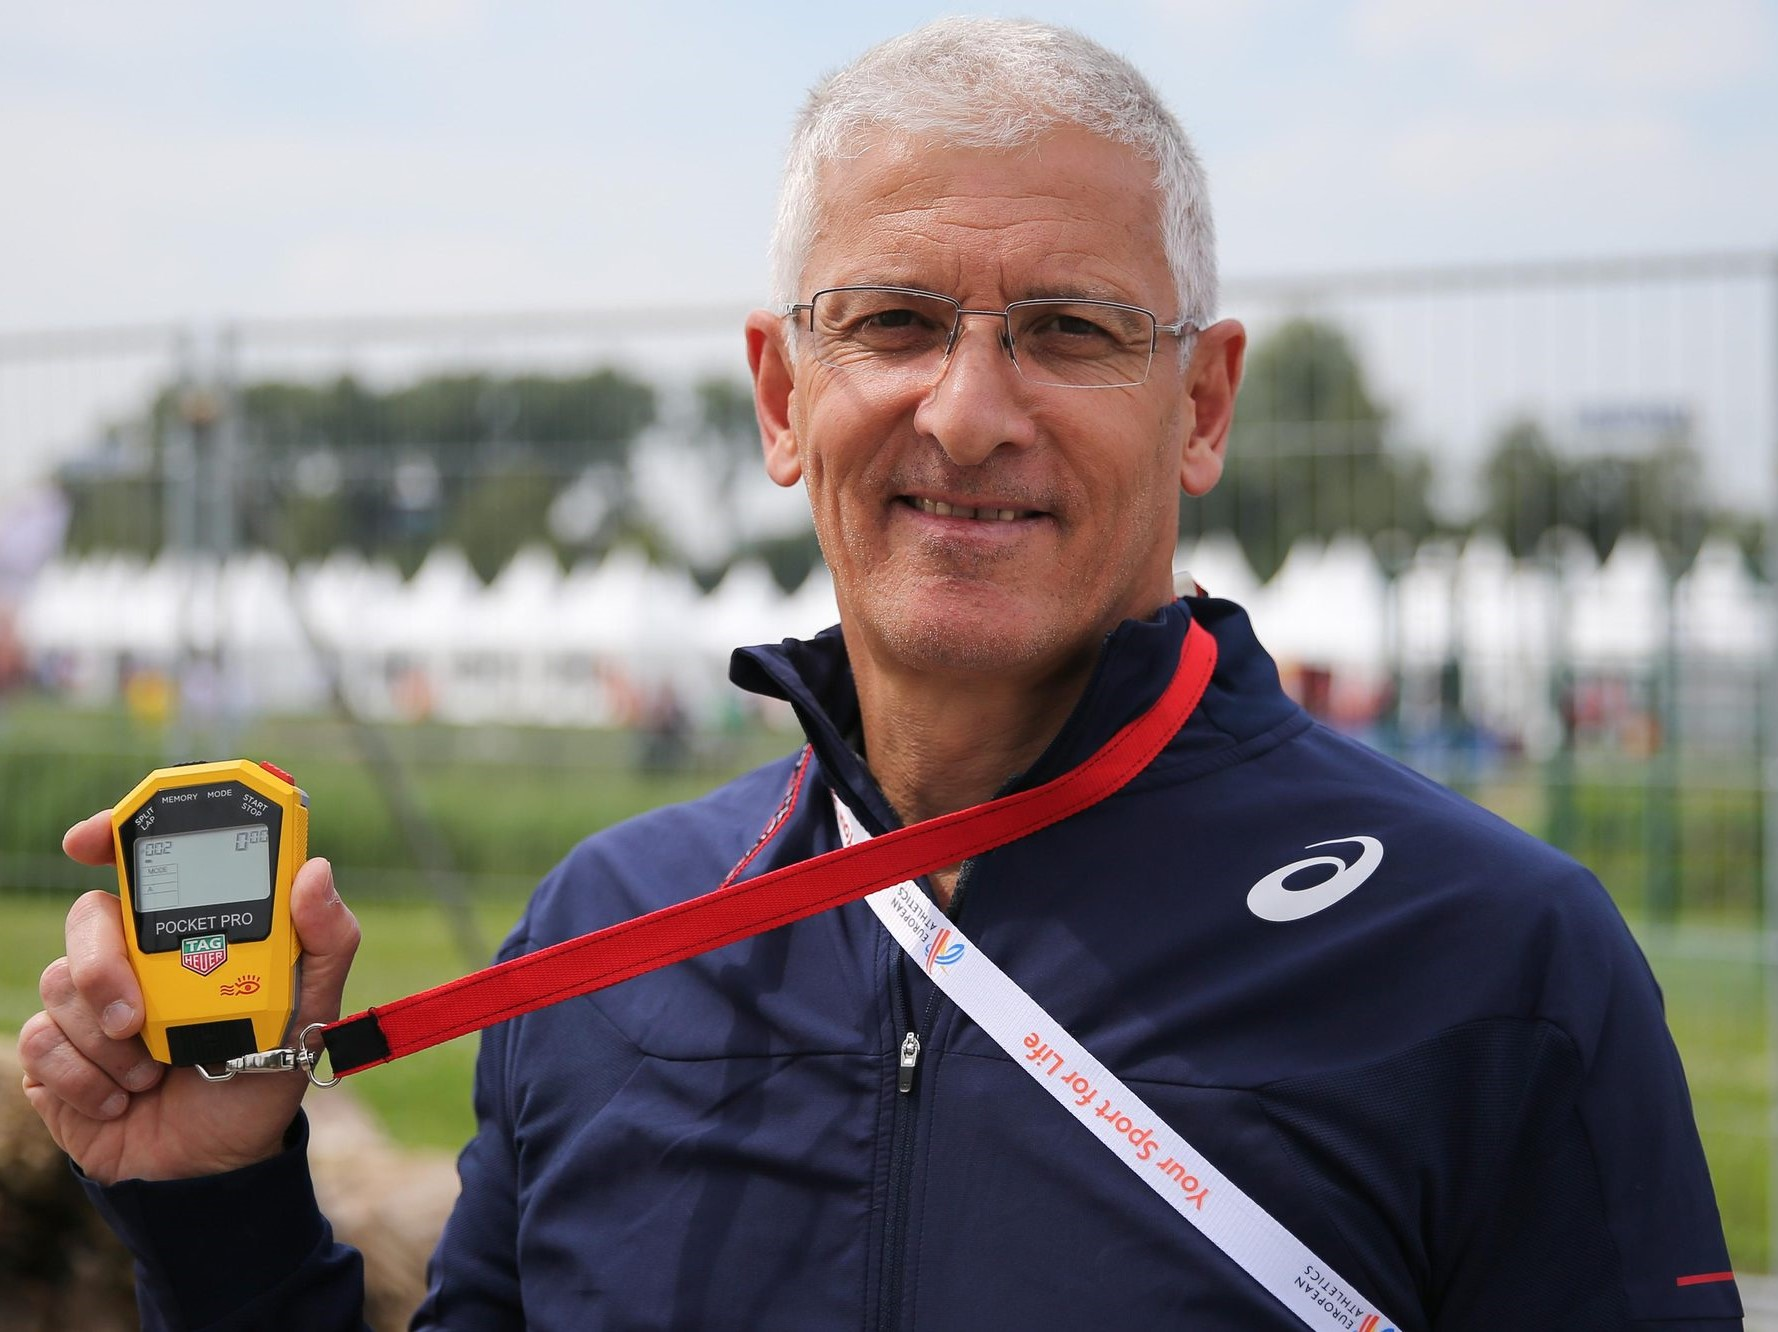 Guy Ontanon Athlétisme WeChamp